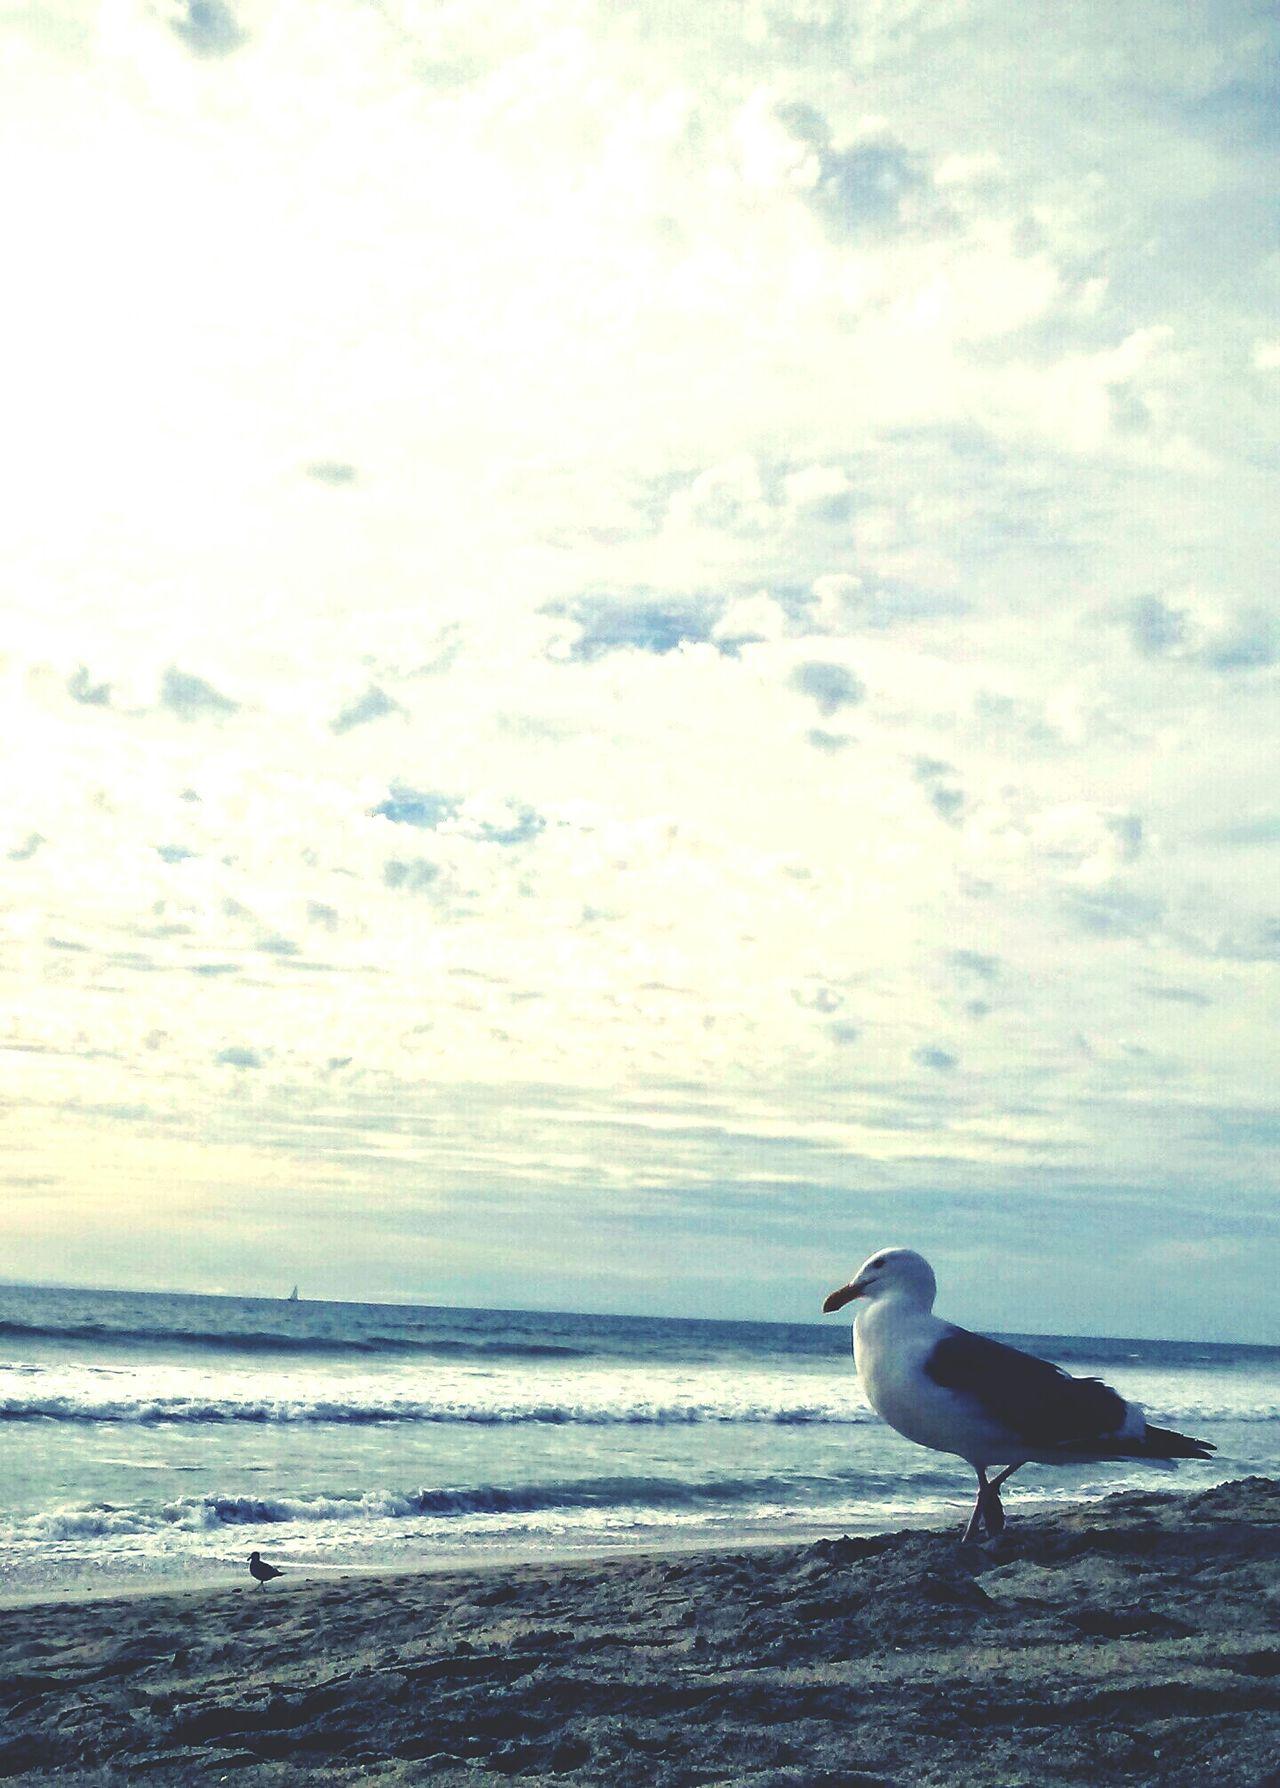 Taking Photos Enjoying Life Sky And Clouds Sand Ocean Carlsbad Beach Beach Photography Beach Chicken Seagull Seagulls